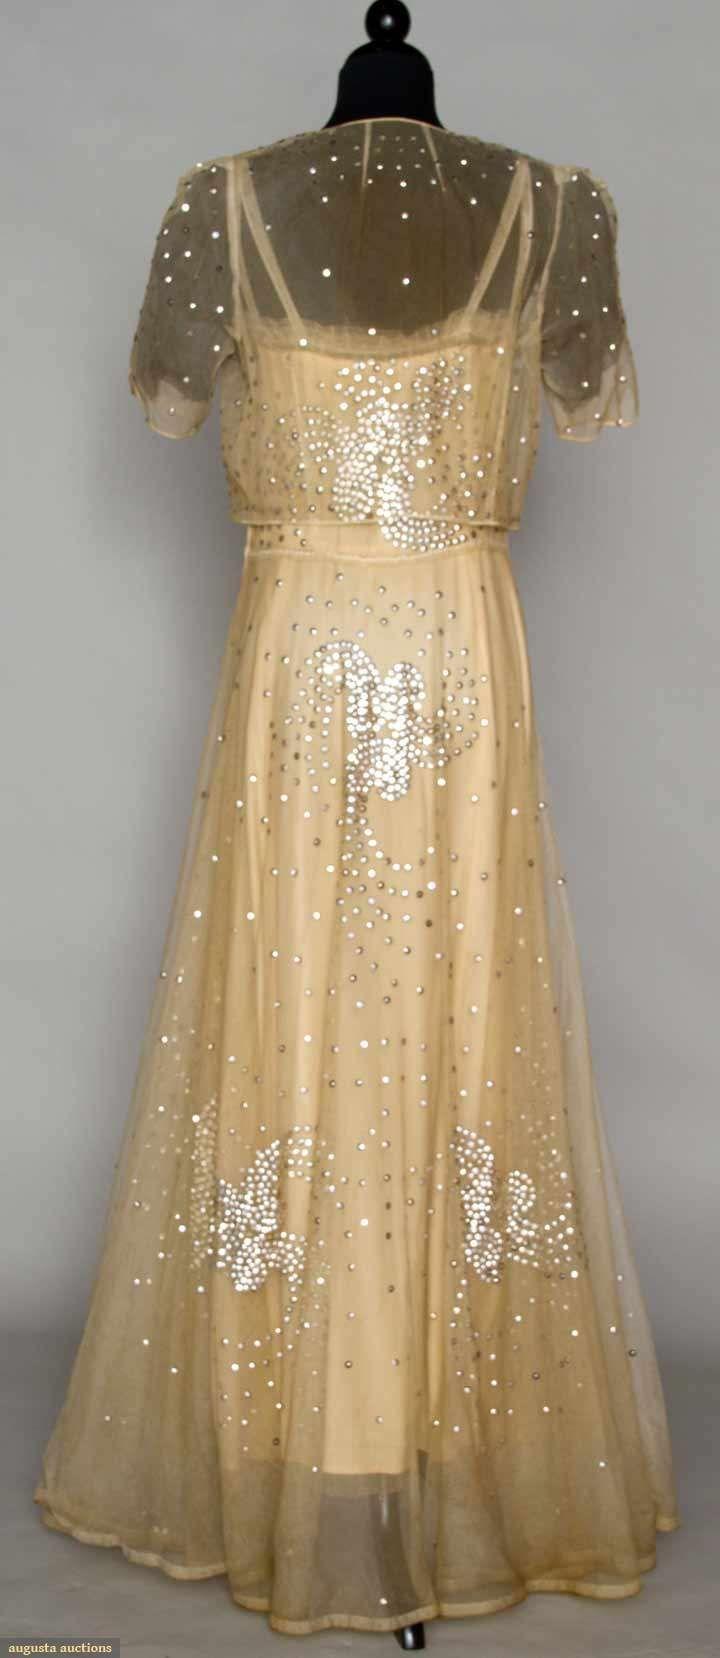 Sequined cream net evening gown c cream cotton net w silver